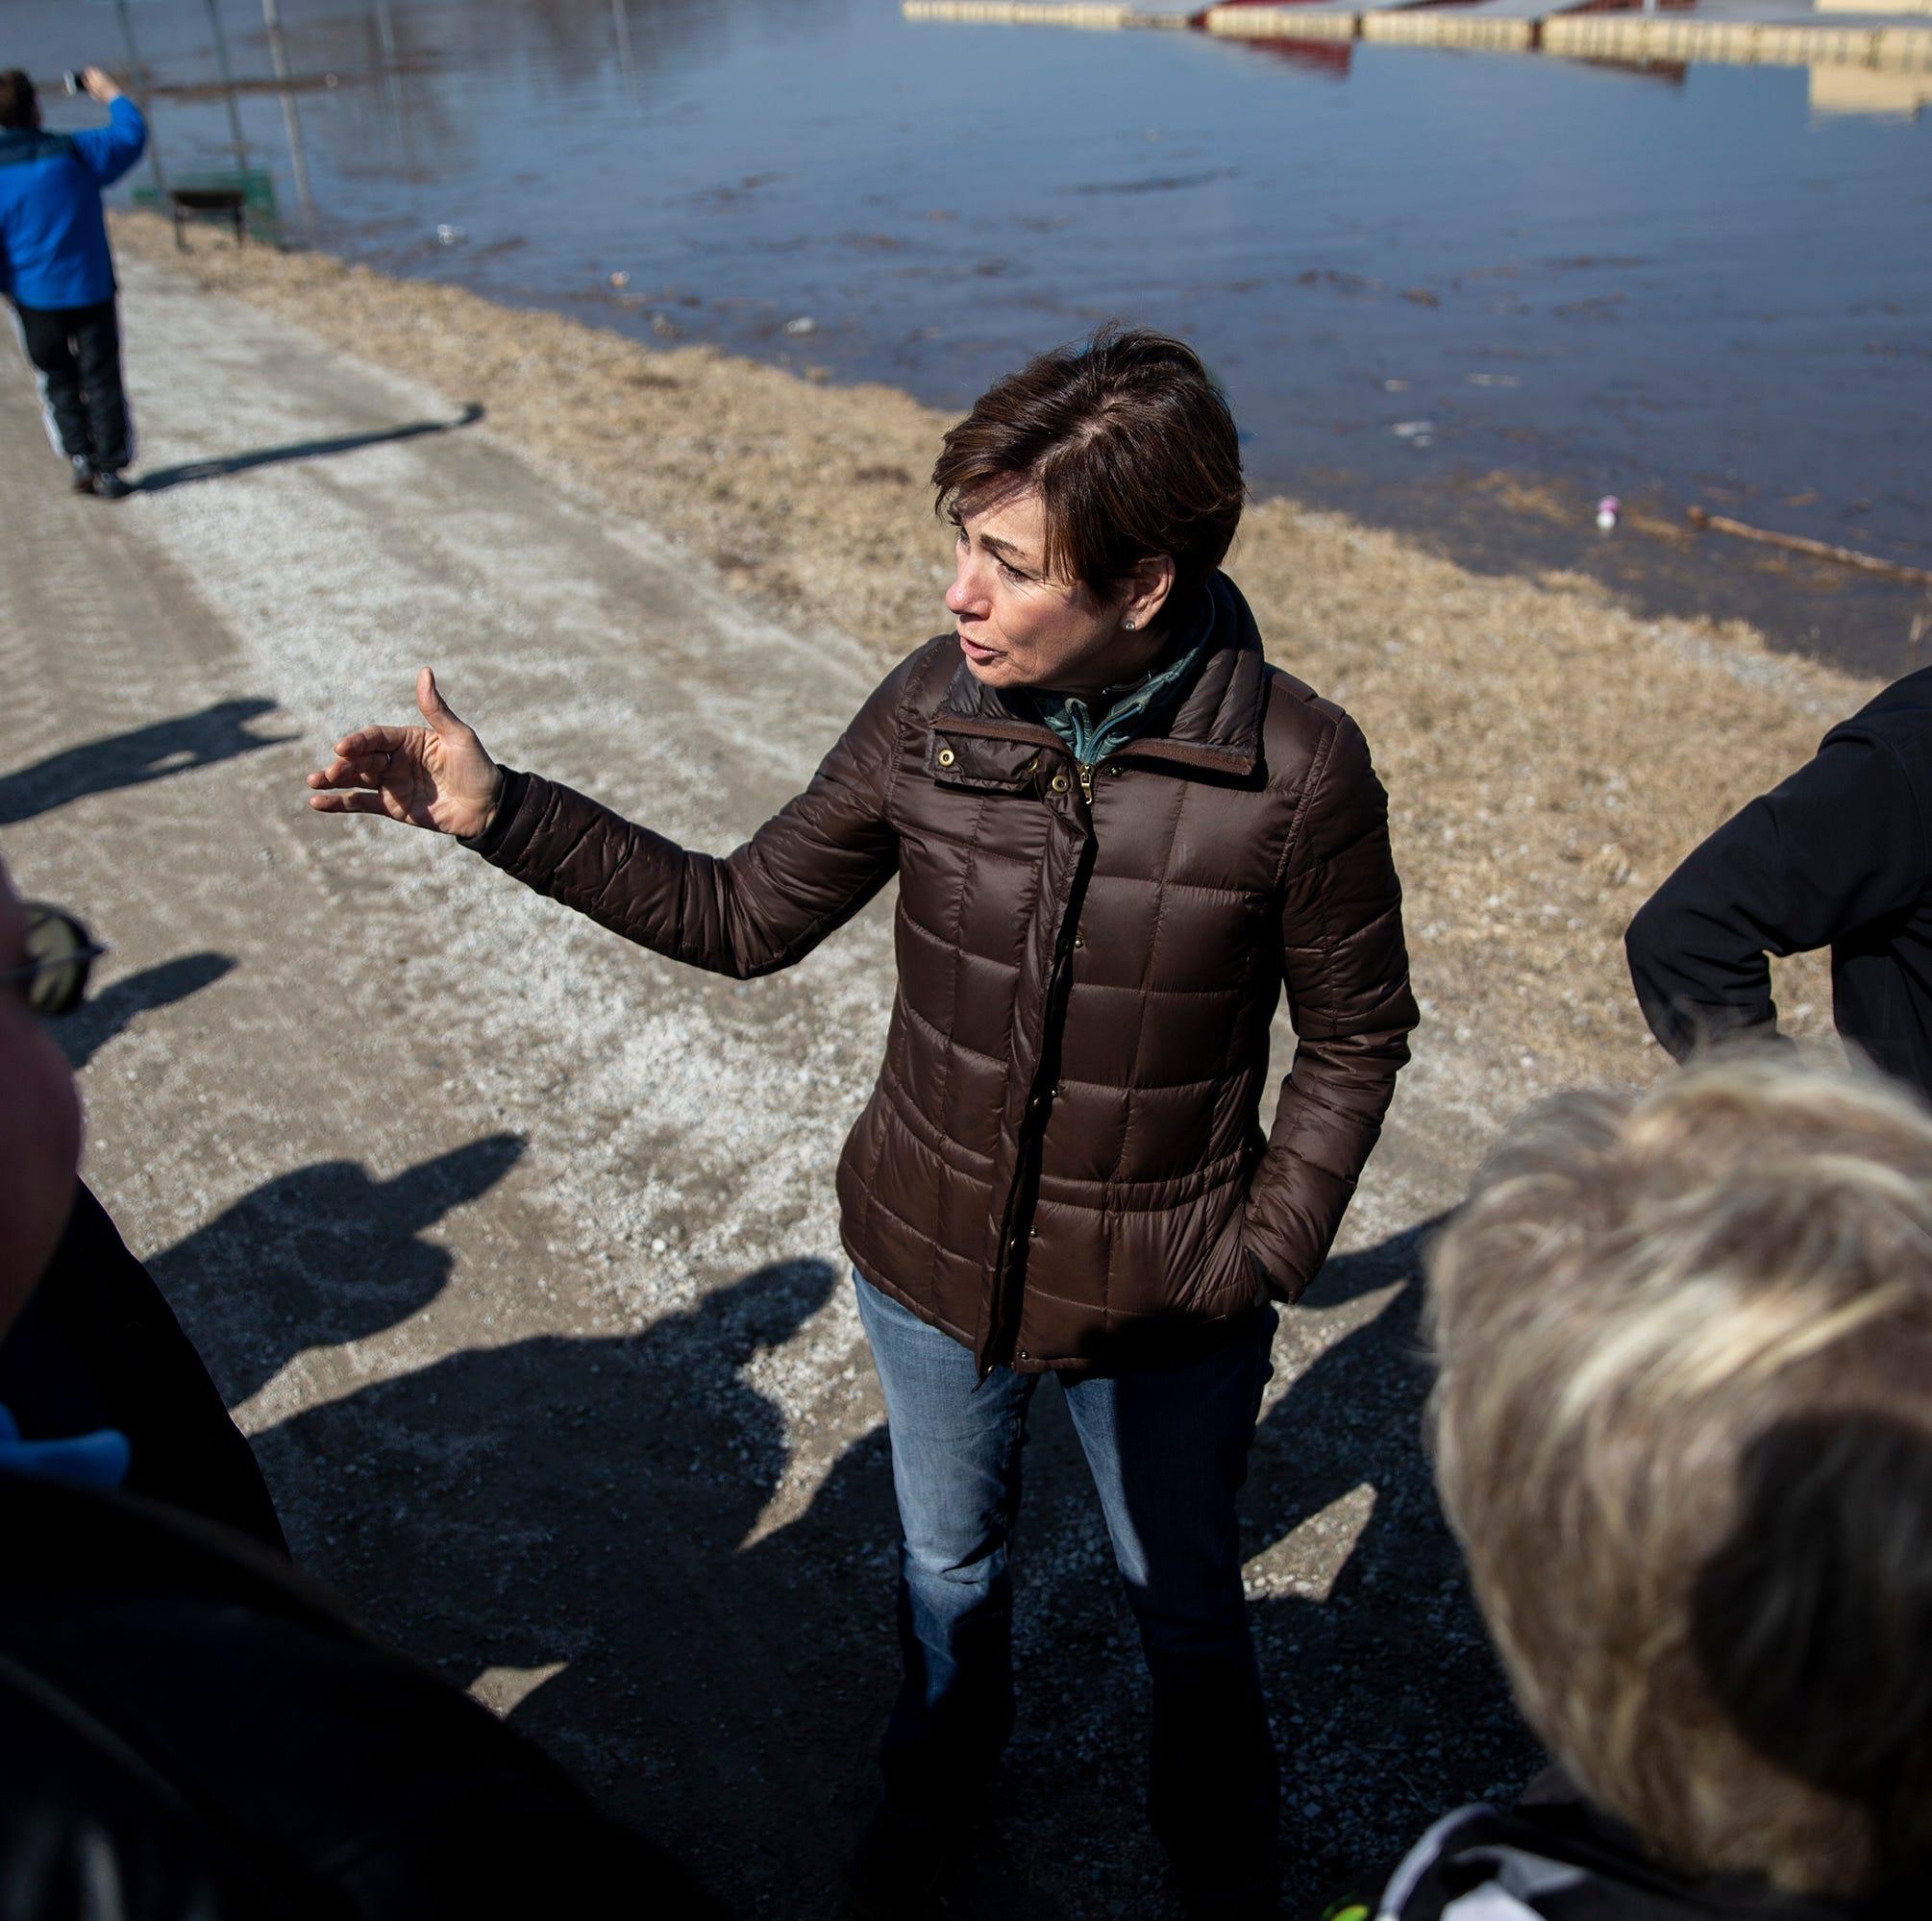 Gov. Kim Reynolds on Iowa flooding: 'It looked like an ocean'